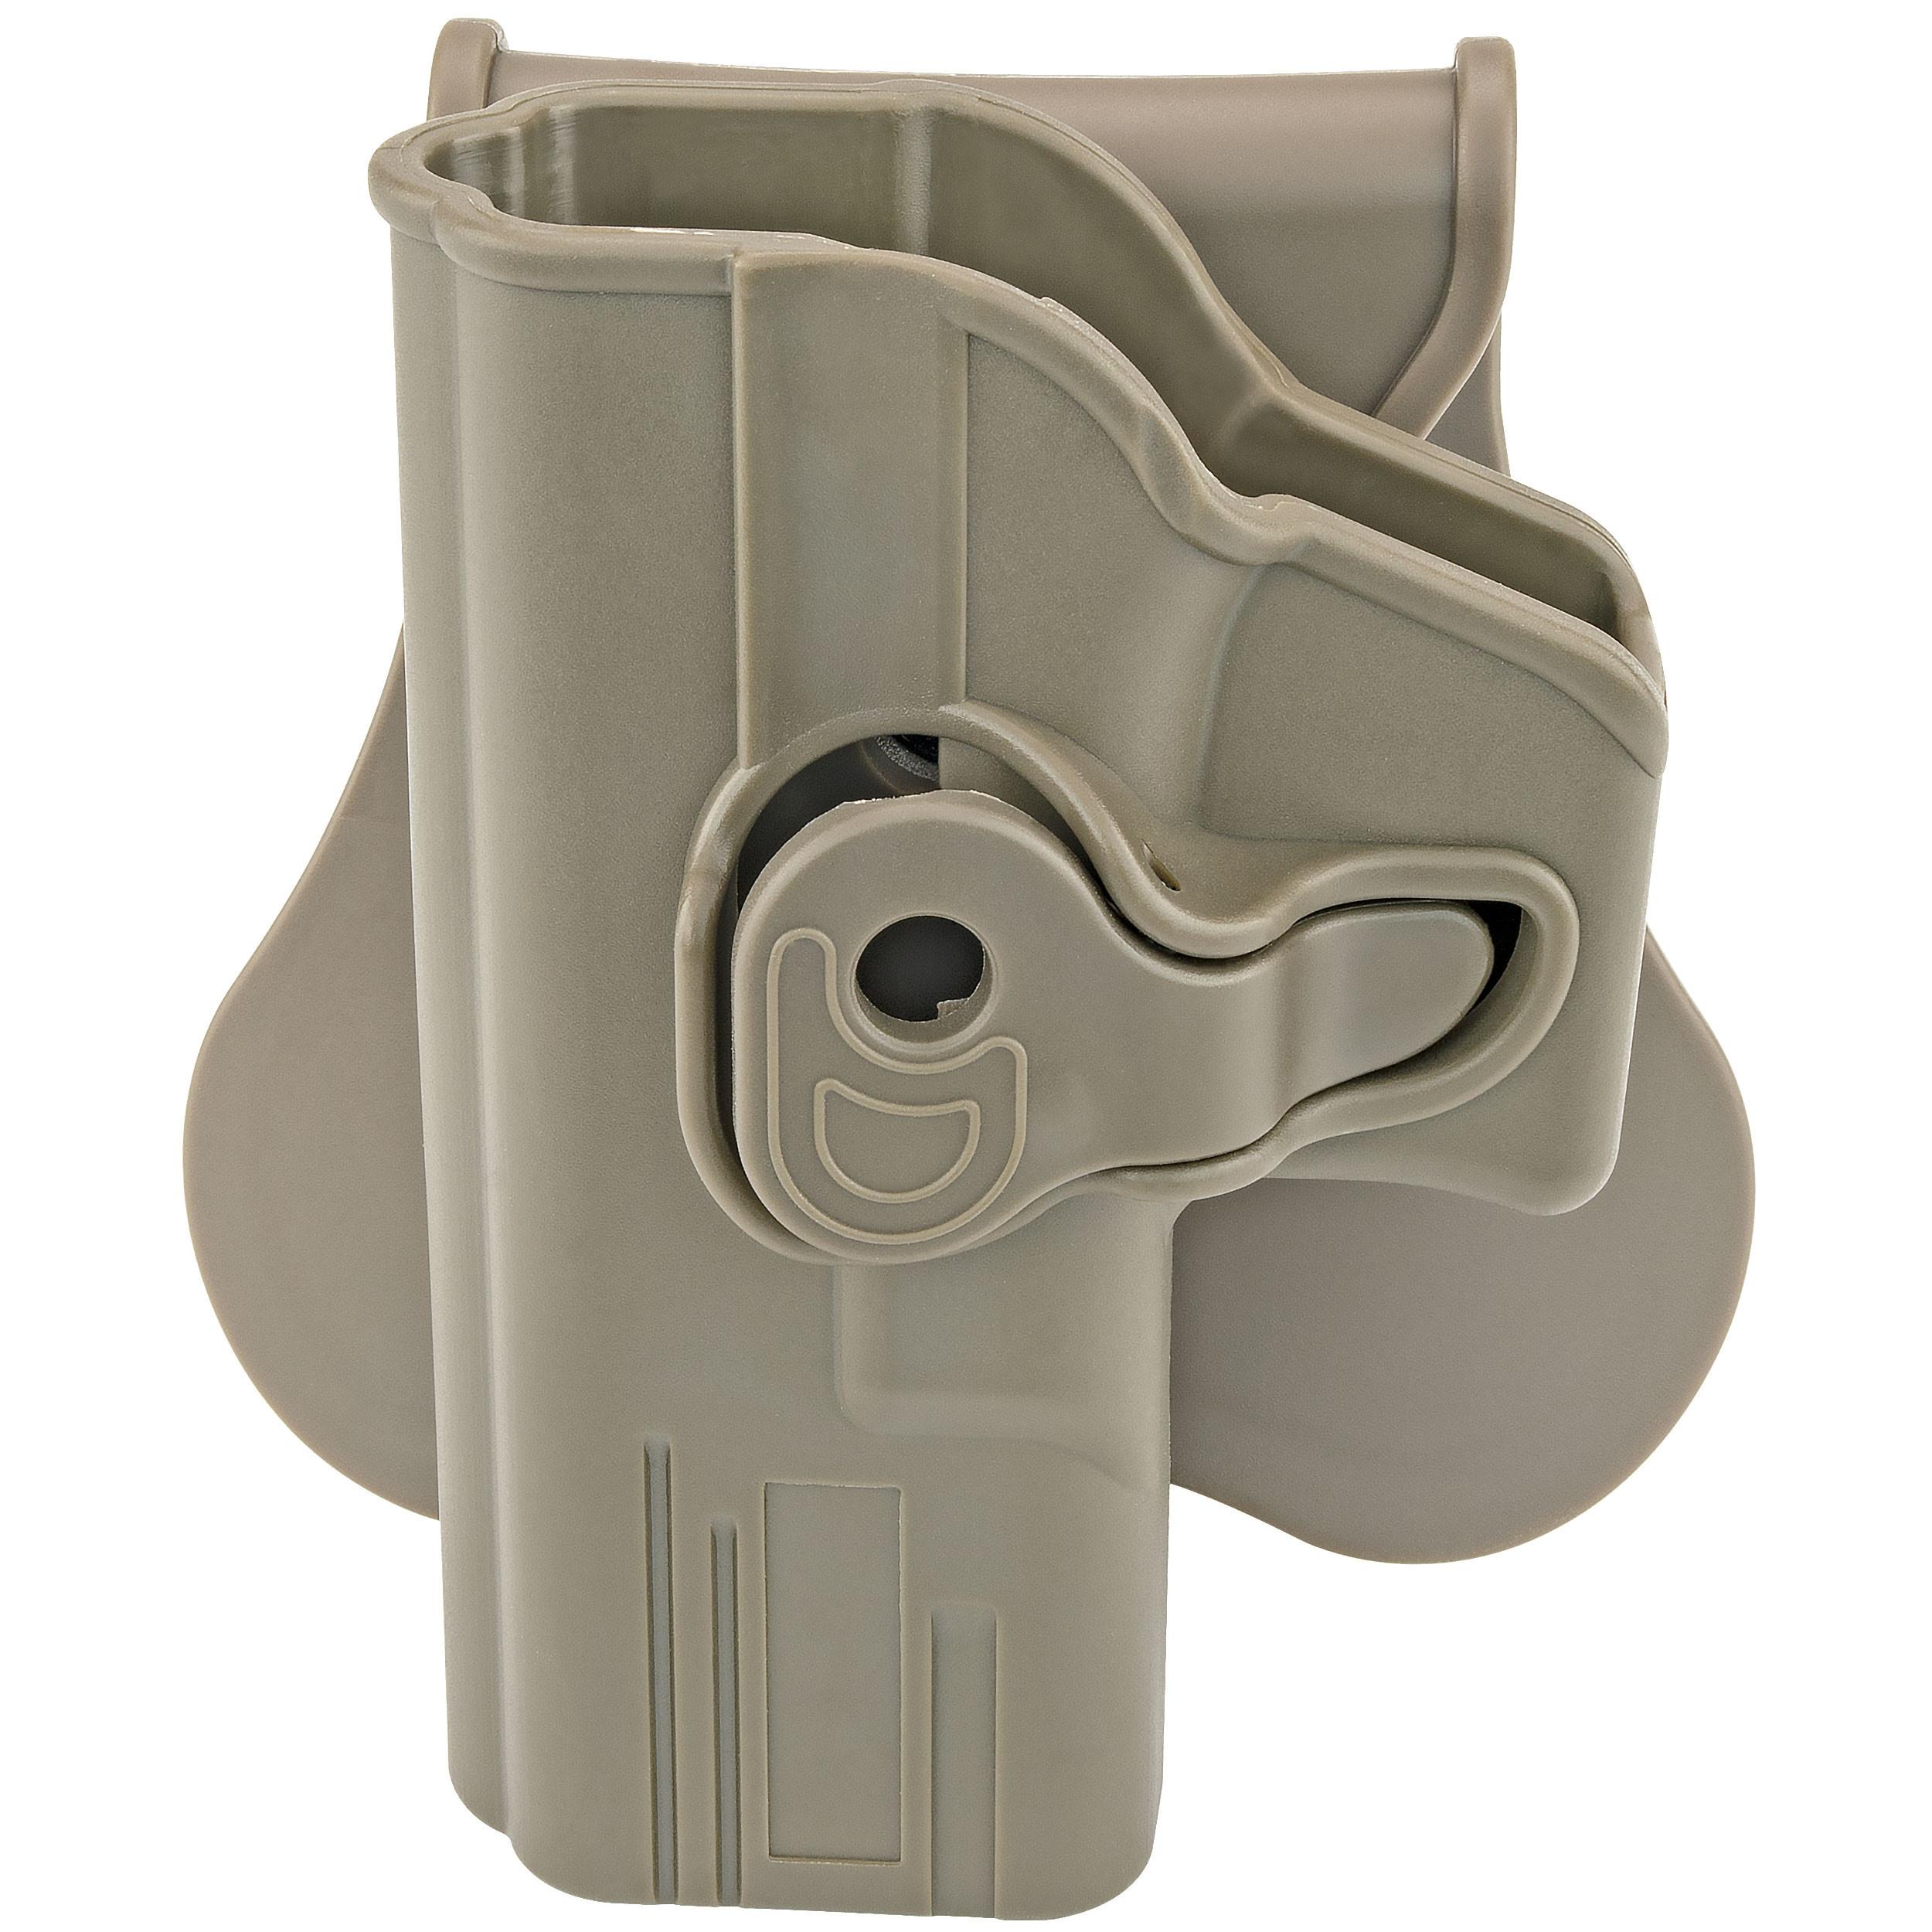 Fits Glock 19, 23, 32 (Gen 1,2,3,4) Left Hand; FDE Holster